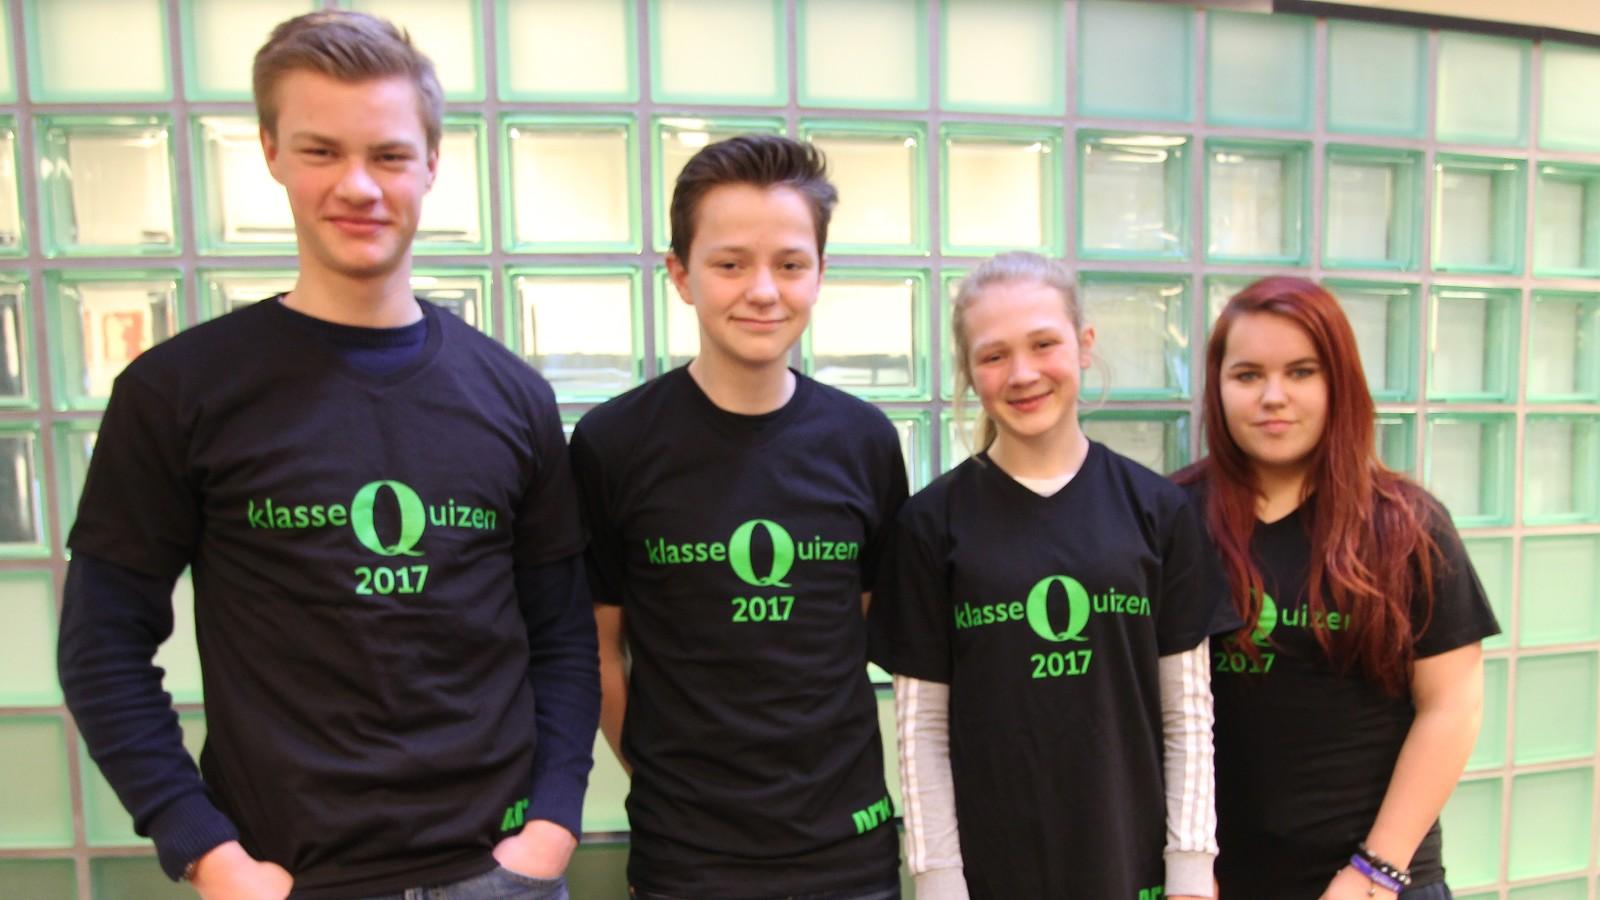 Høyland ungdomsskole fikk 11 poeng i Klassequizen. På laget var Harald Egeland, Jakob Flaten, Ingrid Haga og Tiril Aasen (vara).